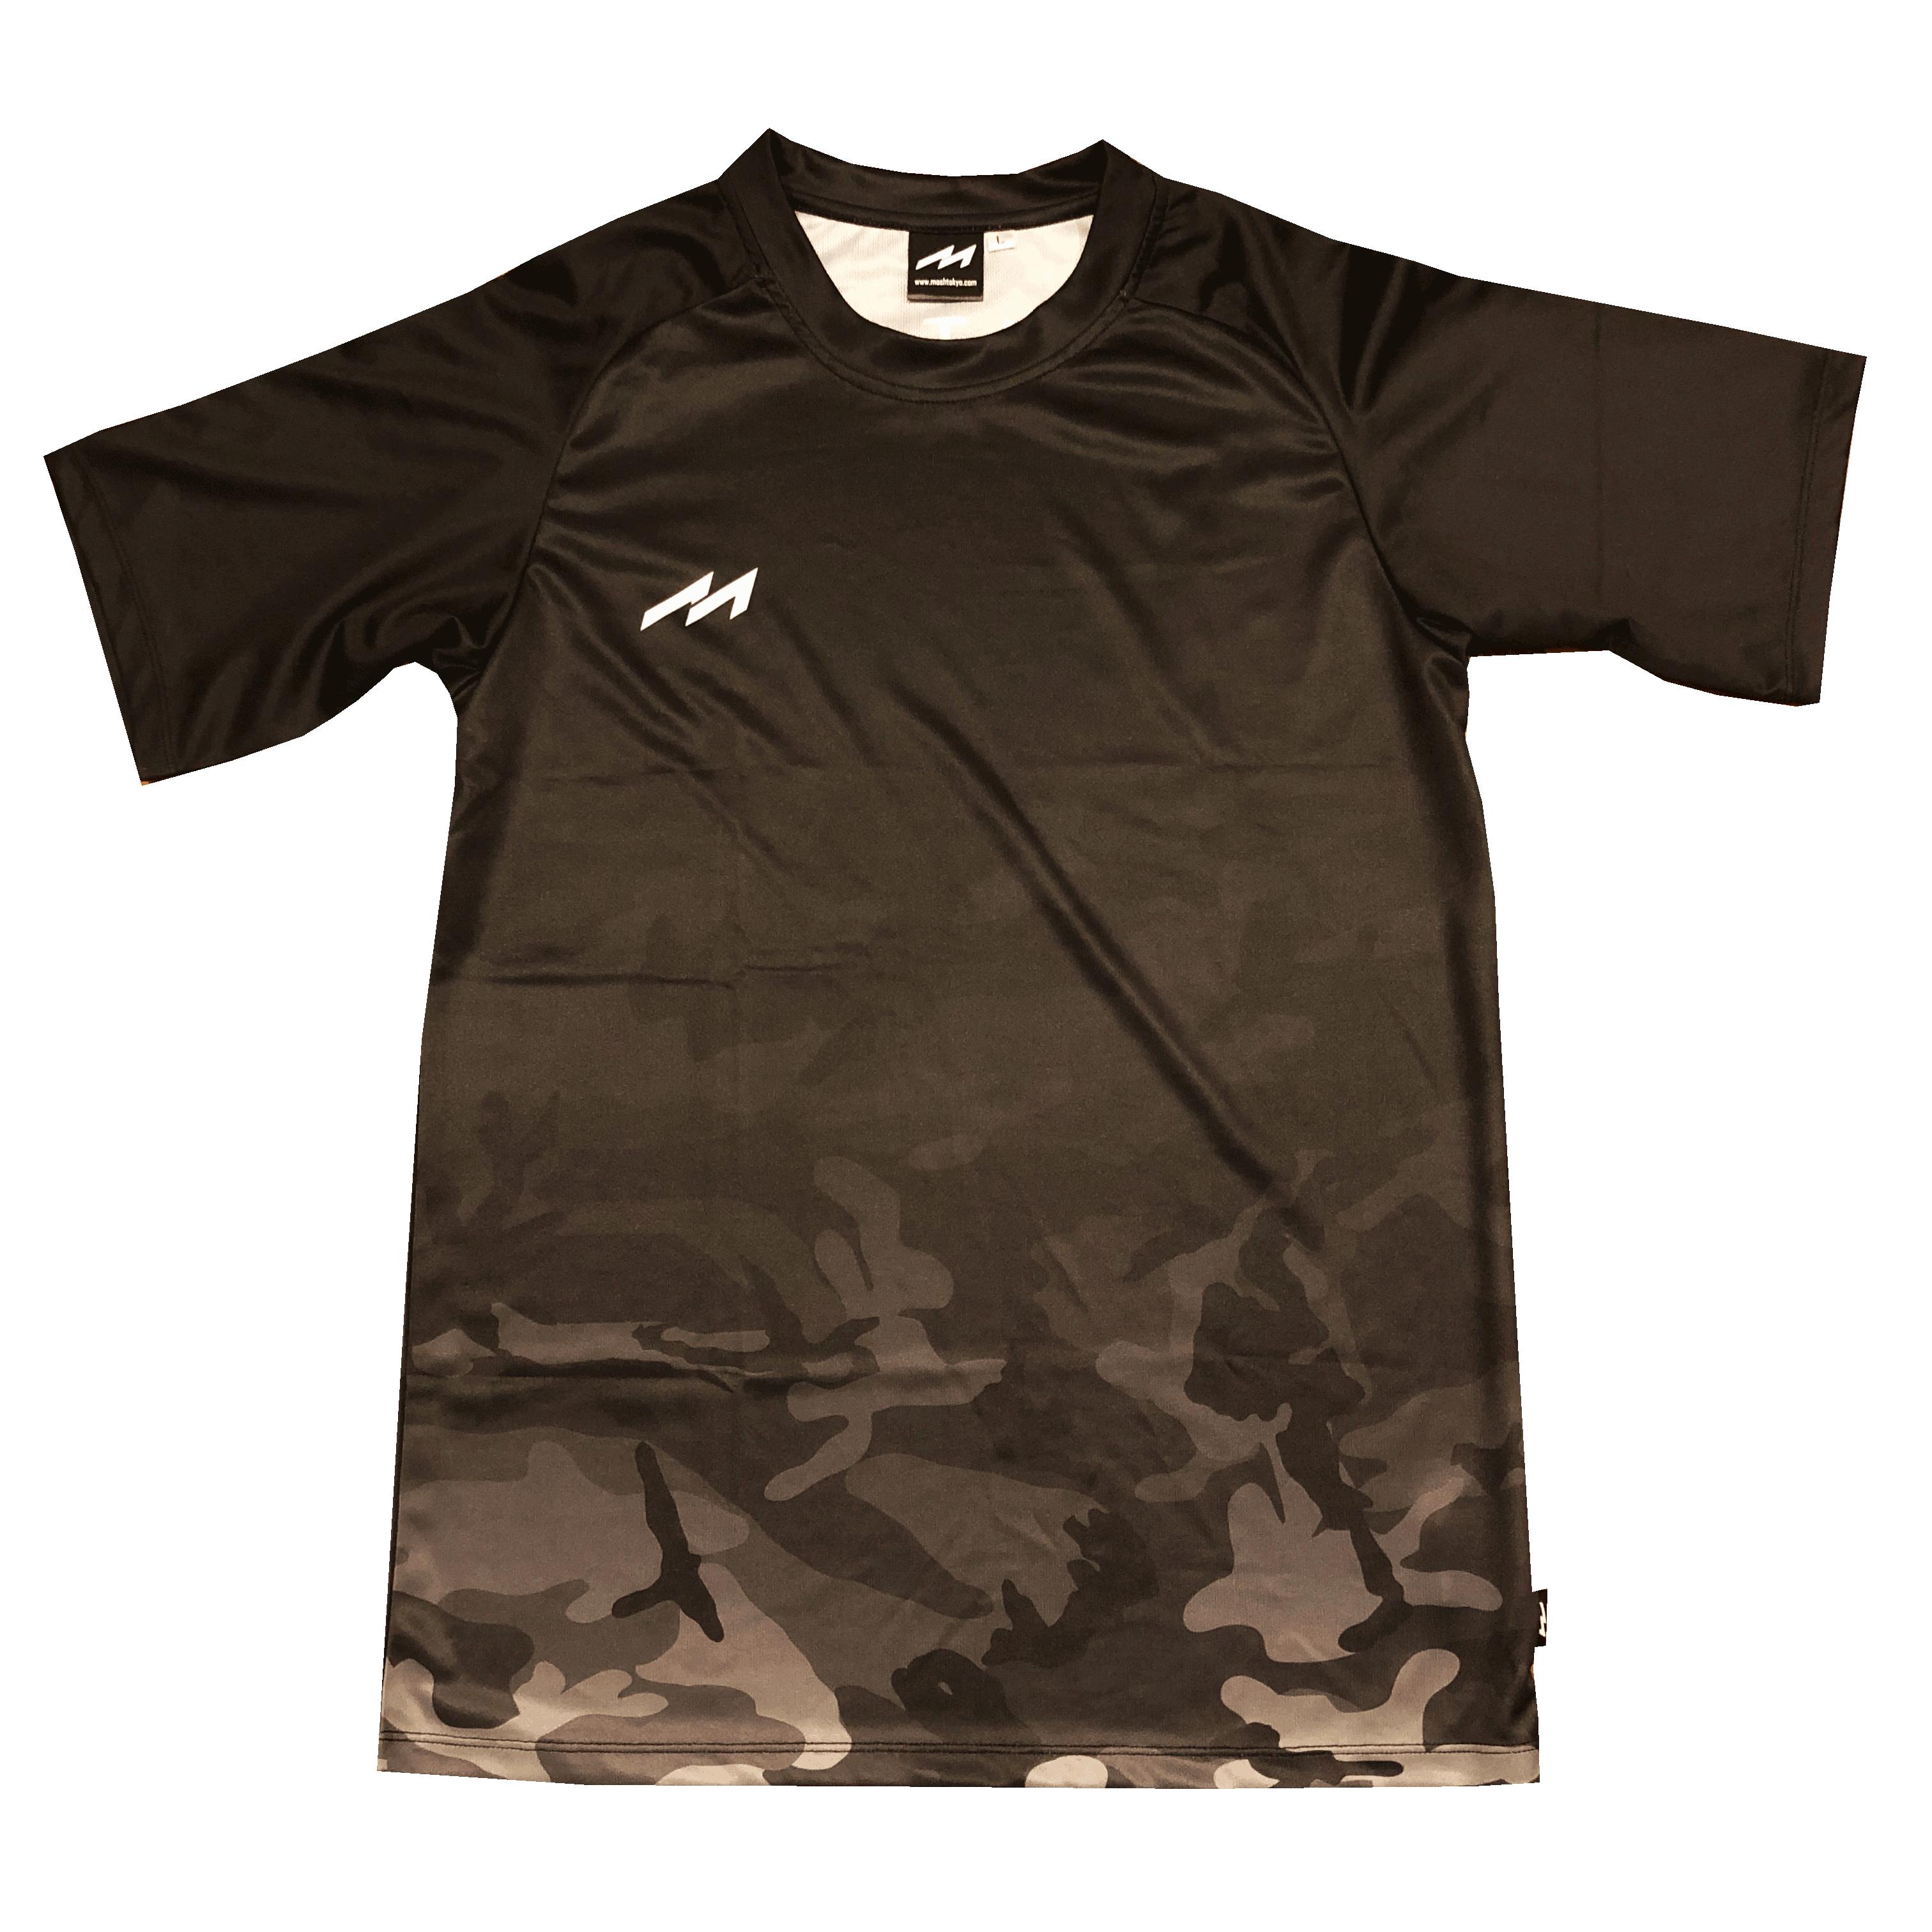 Fade Camo Shirts (MHS-2013 BLK)